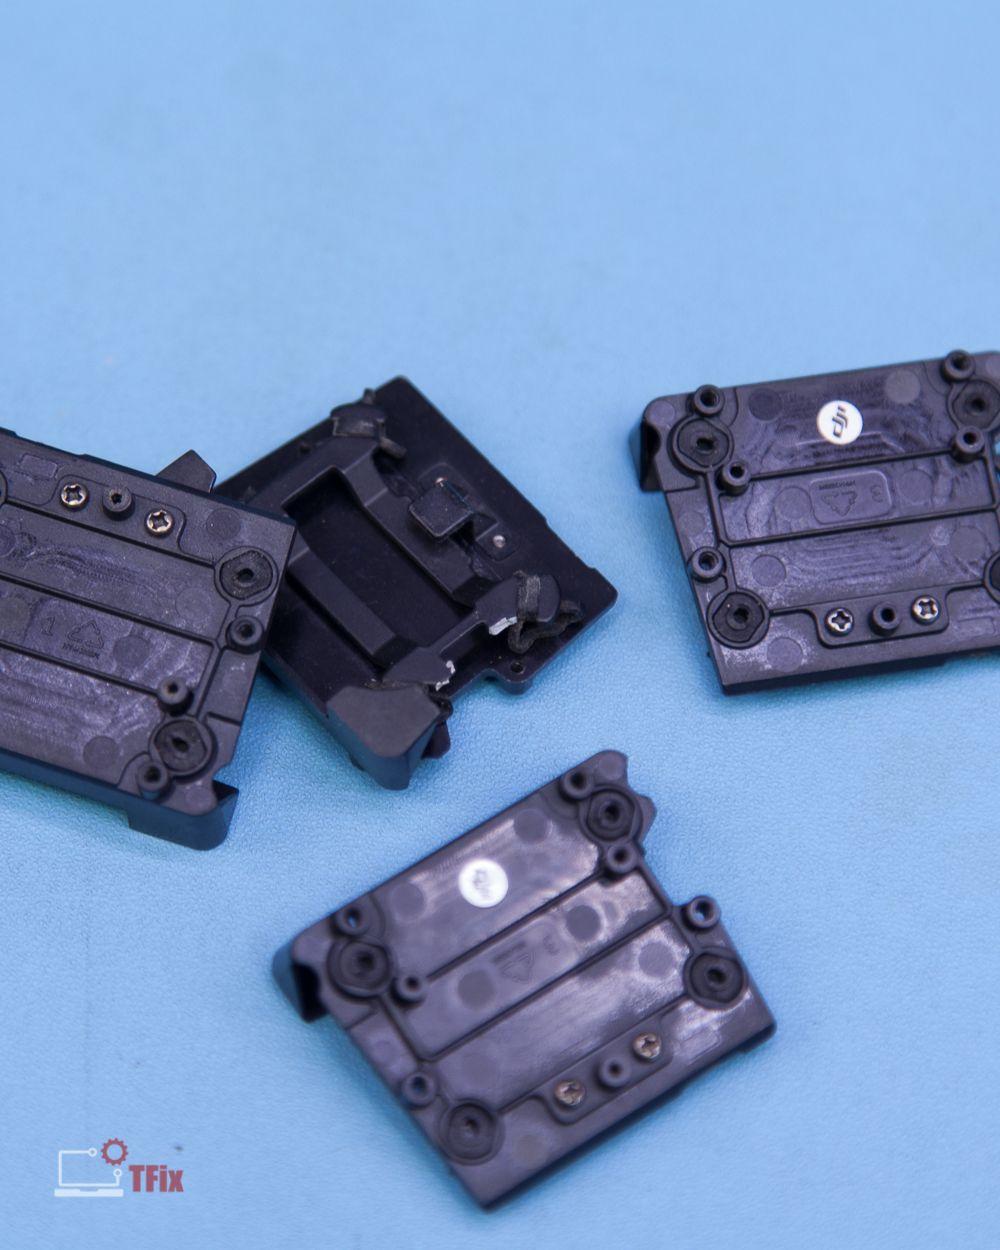 Dji mavic pro vibration absorbing board replacement